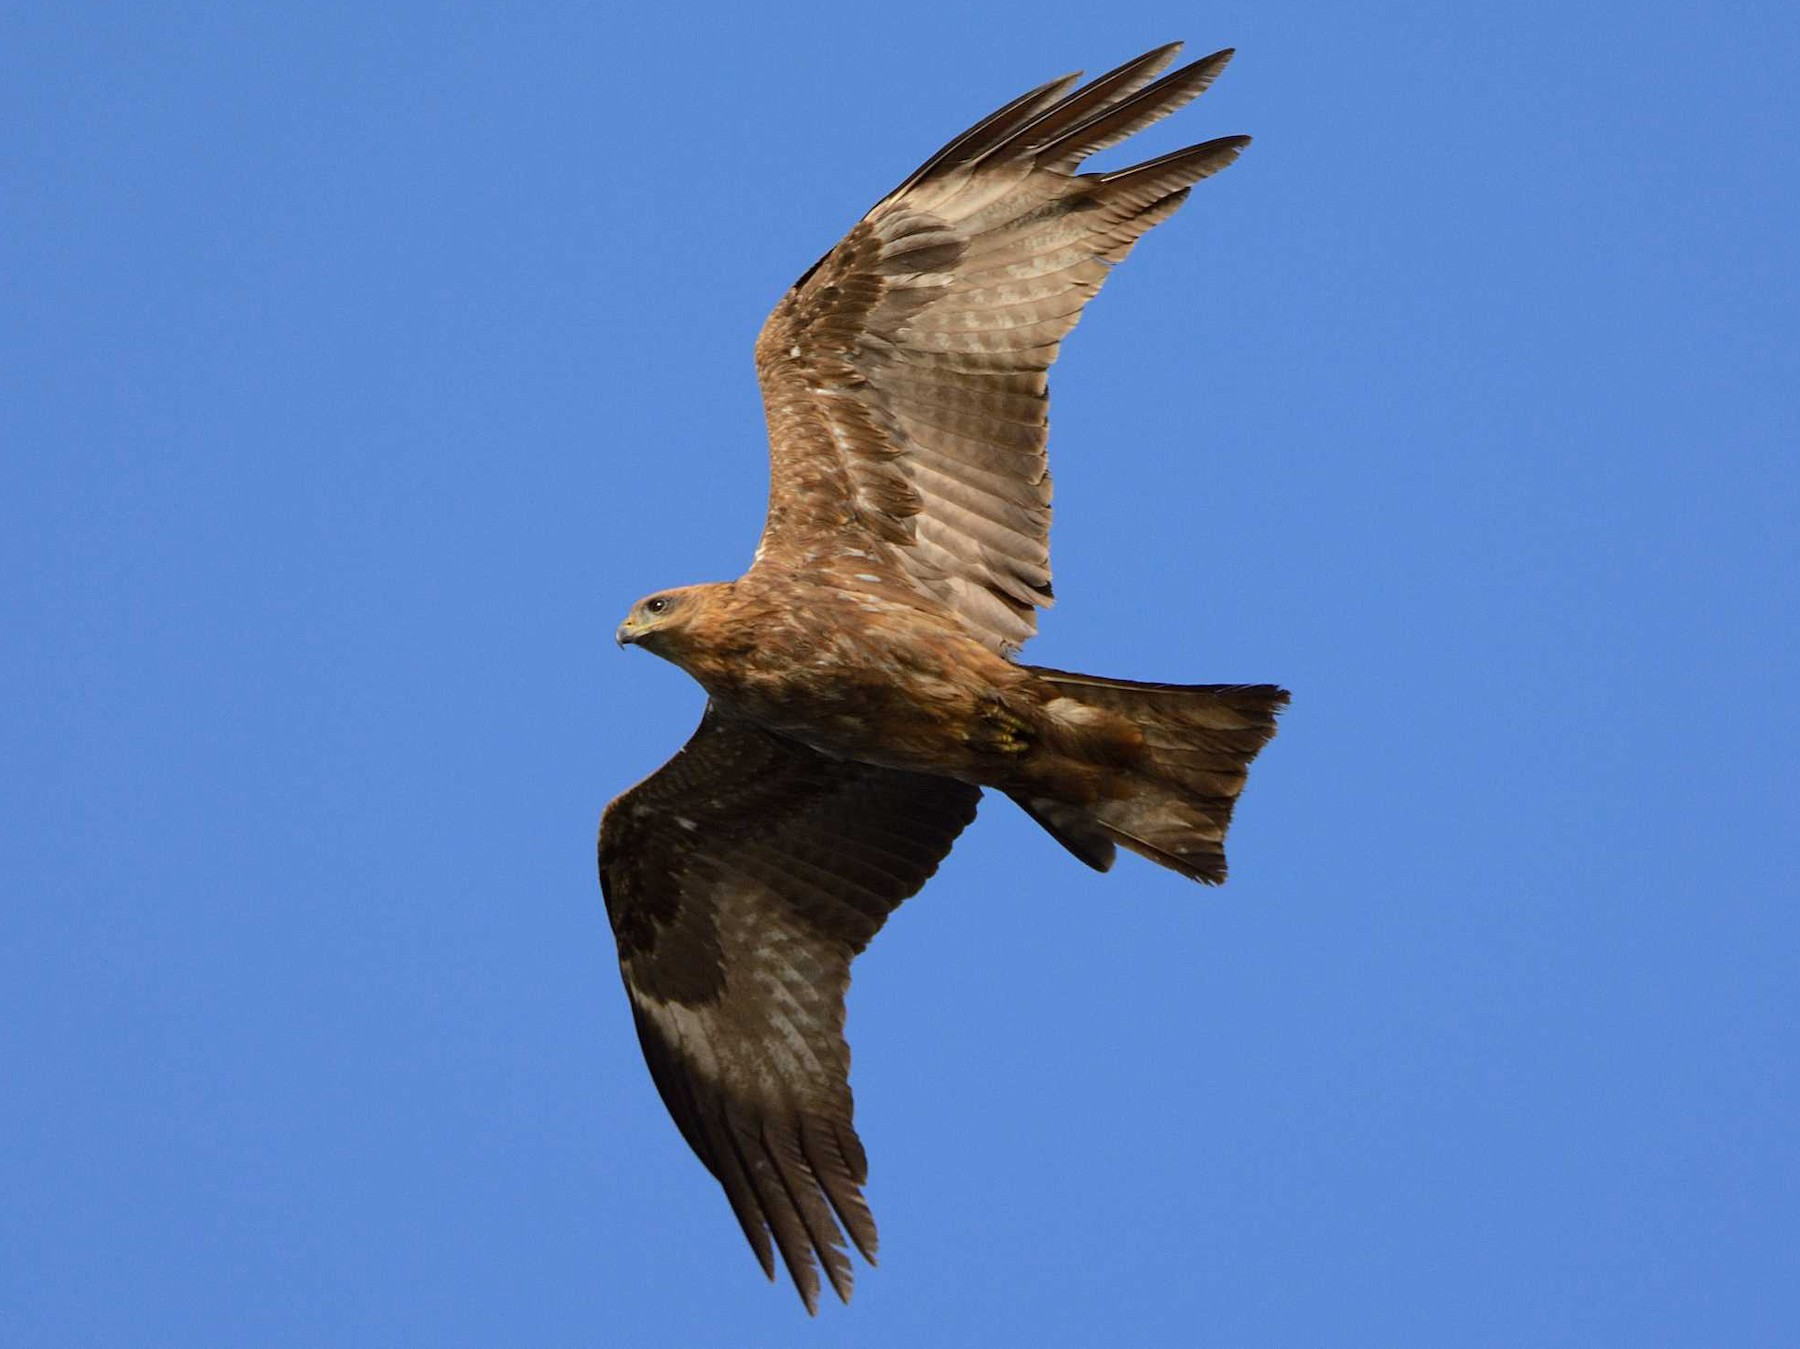 Black Kite - Eric francois Roualet